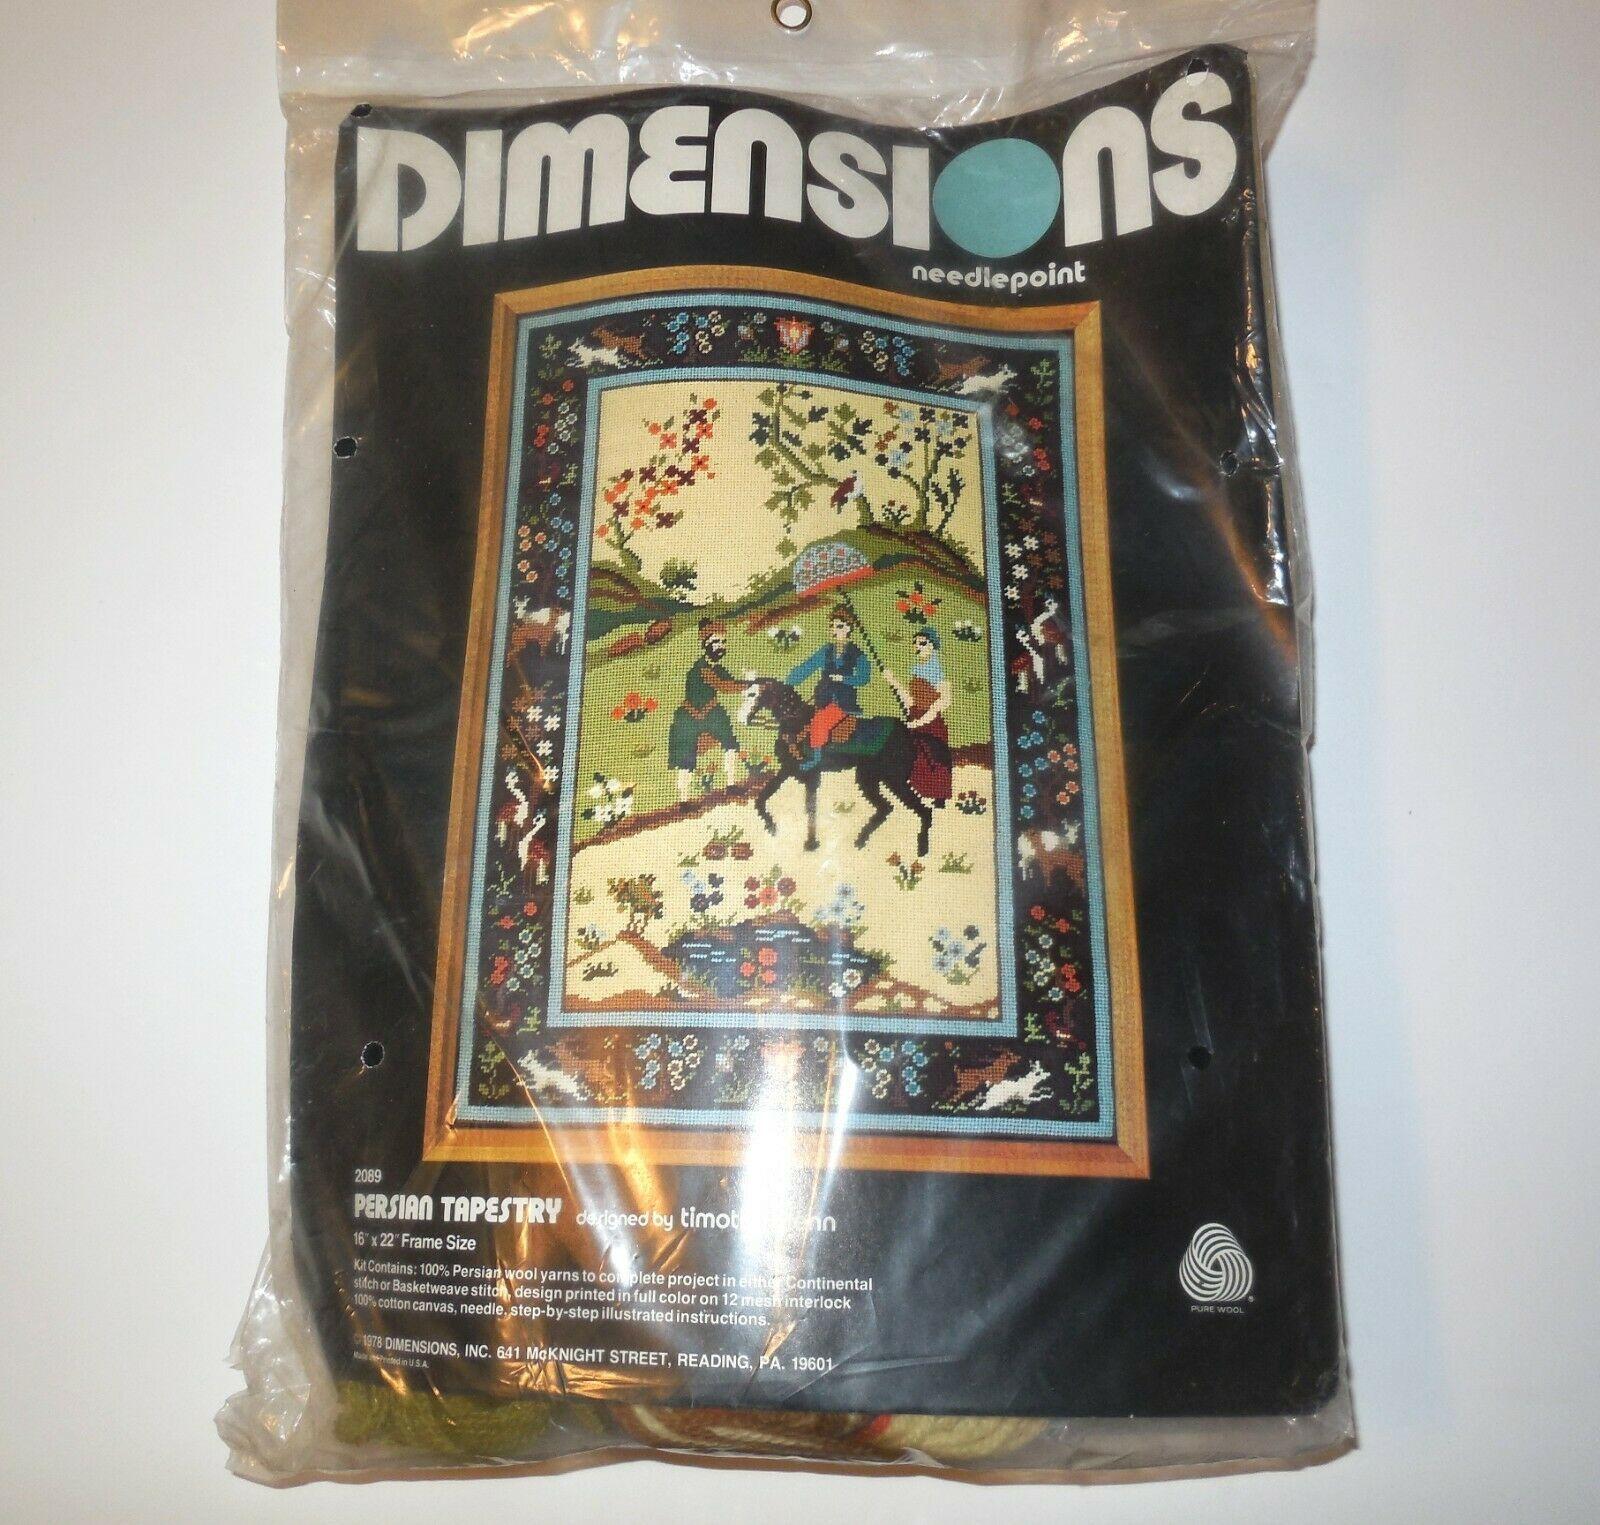 Dimensions Needlepoint new PERSIAN TAPESTRY #2089 NIP 1978 Timothy Glenn Vtg - $65.00